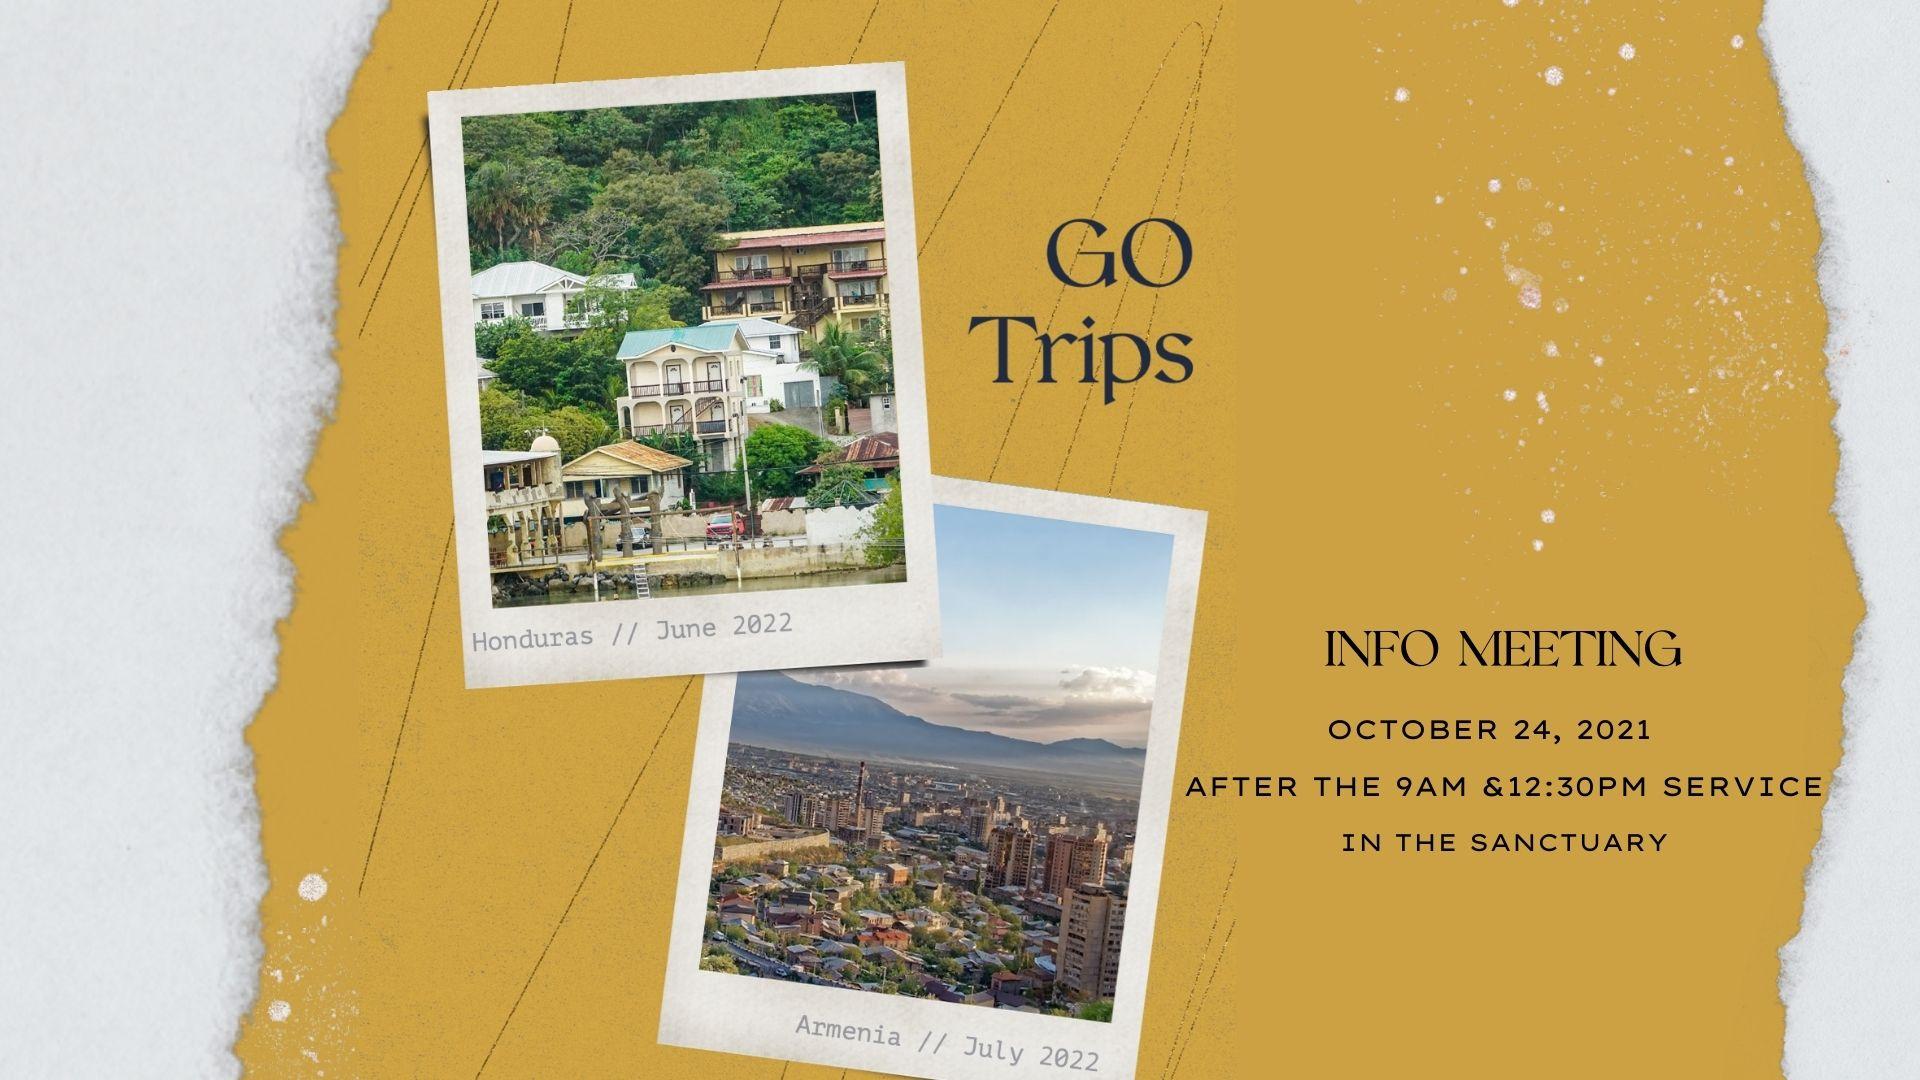 GO Trip Info Meeting